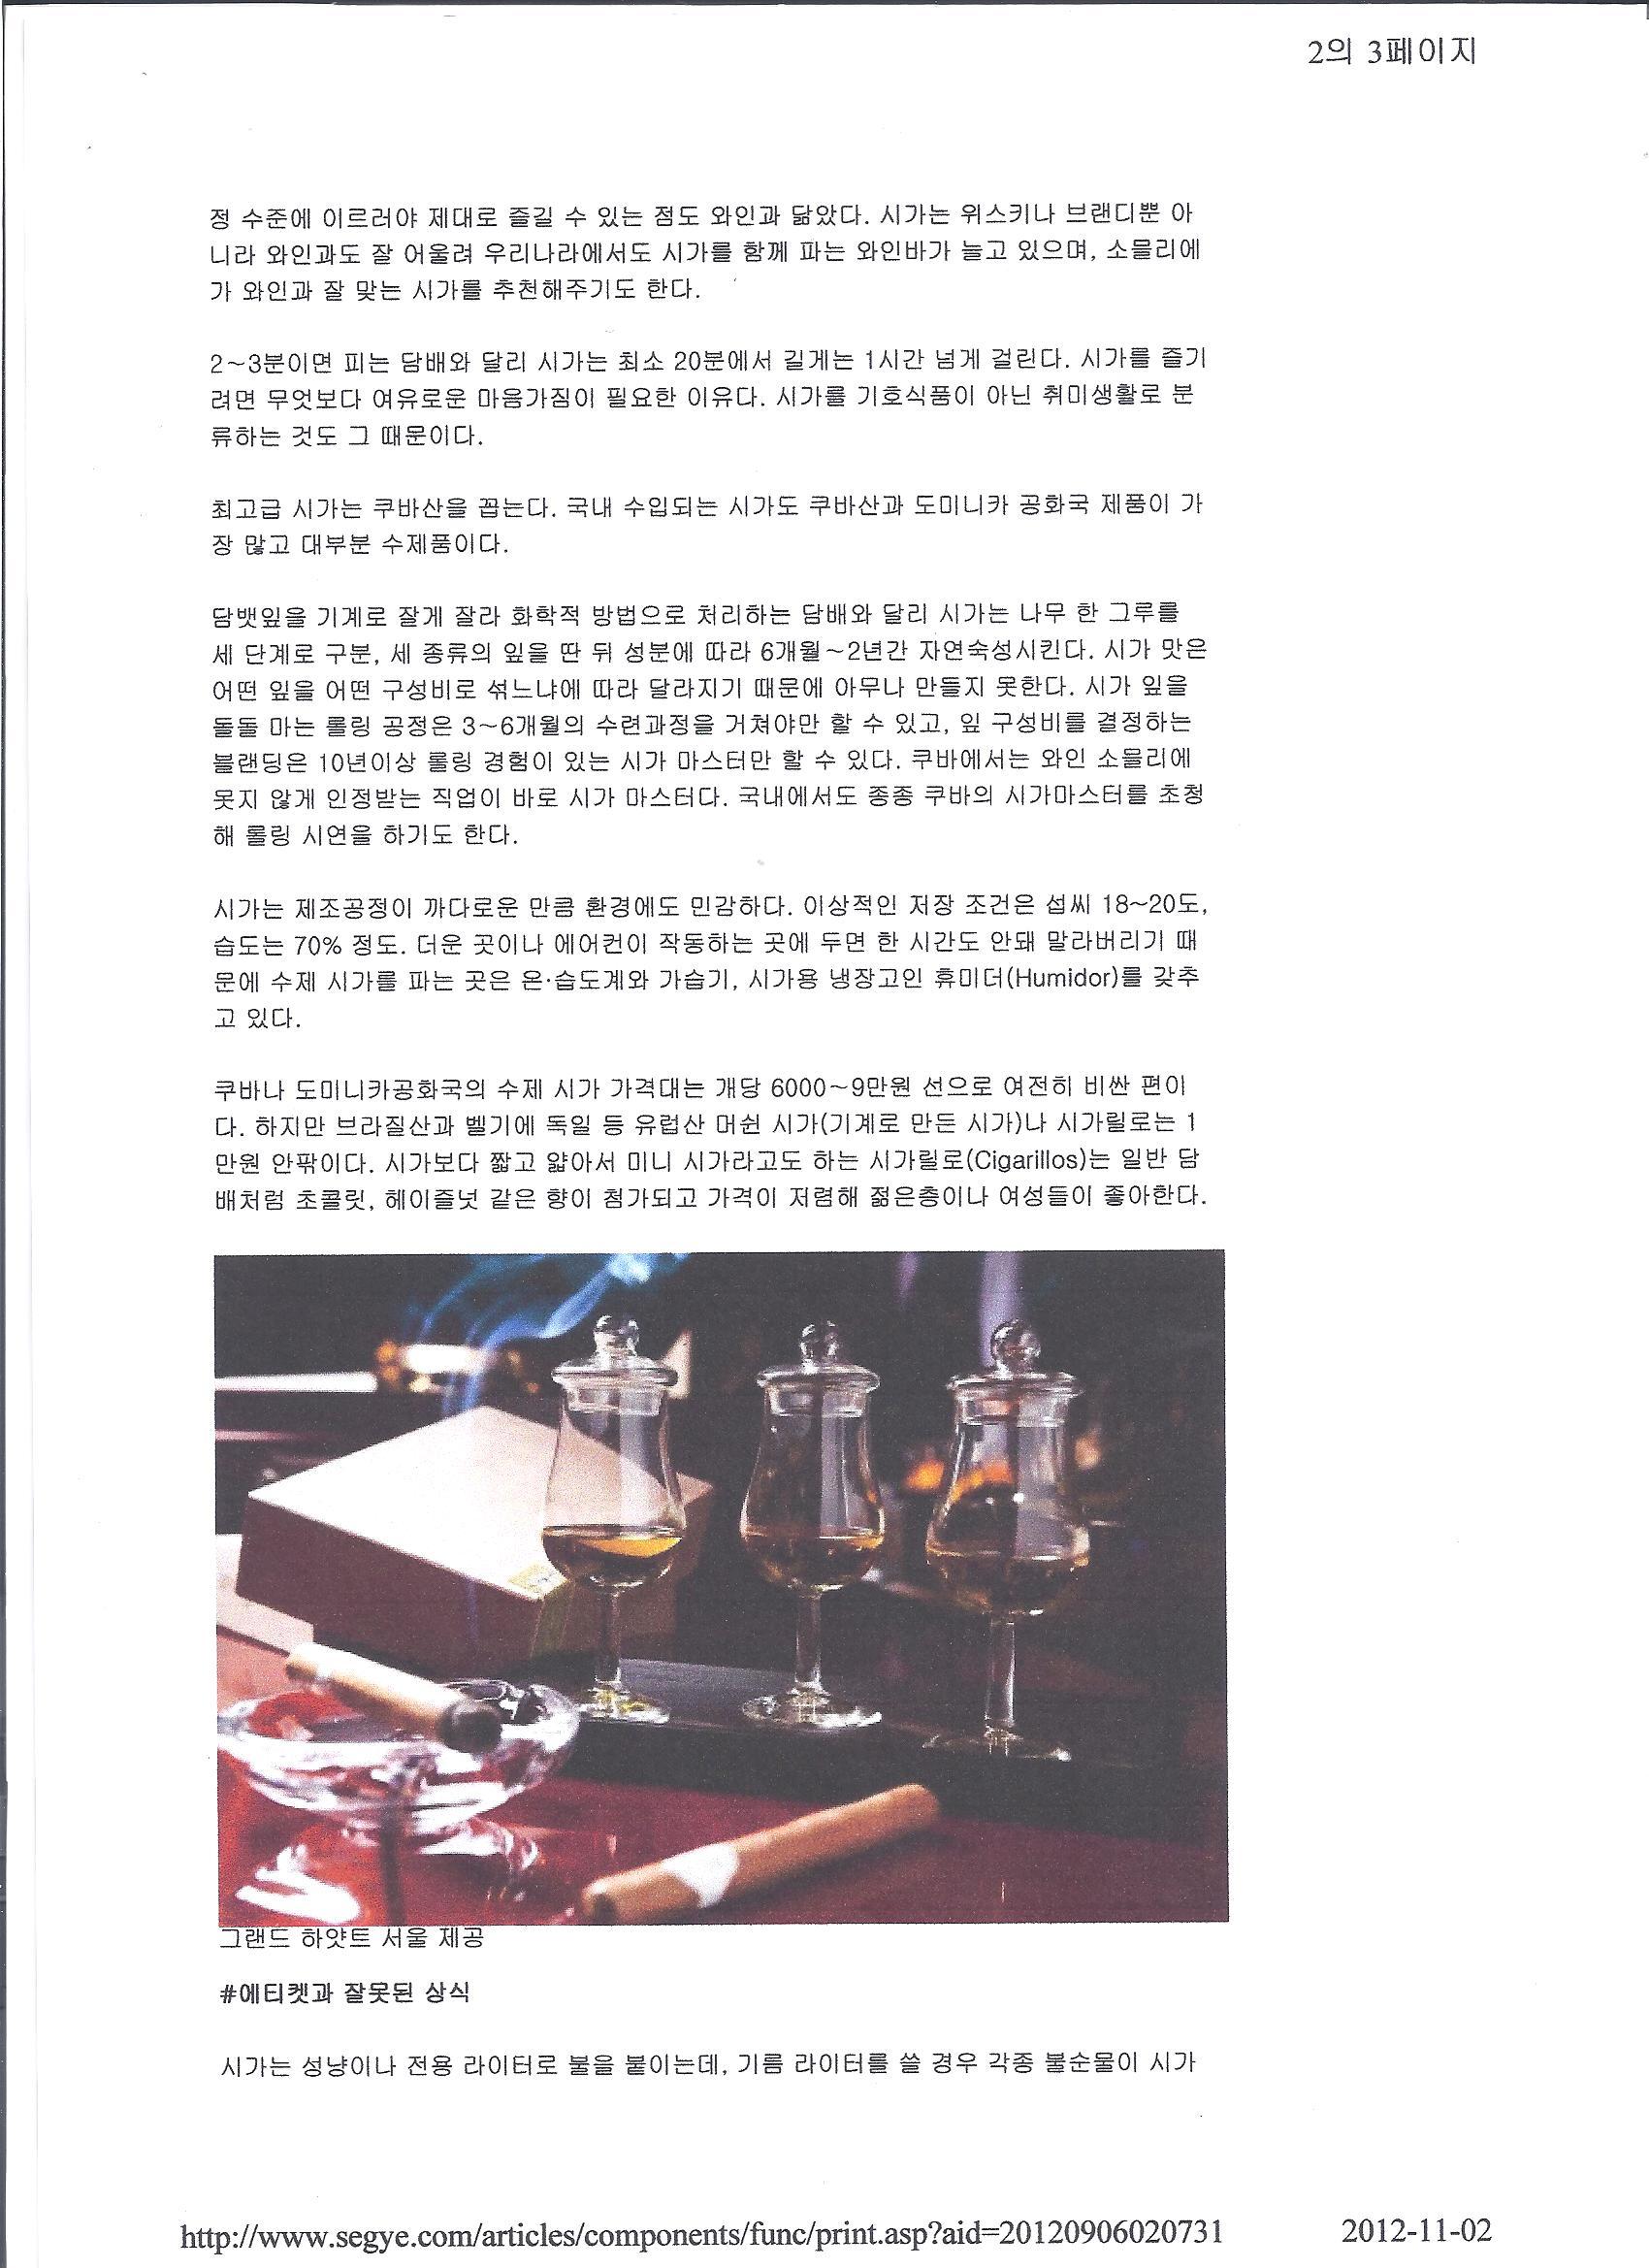 2012-9 Segye article 2.jpg